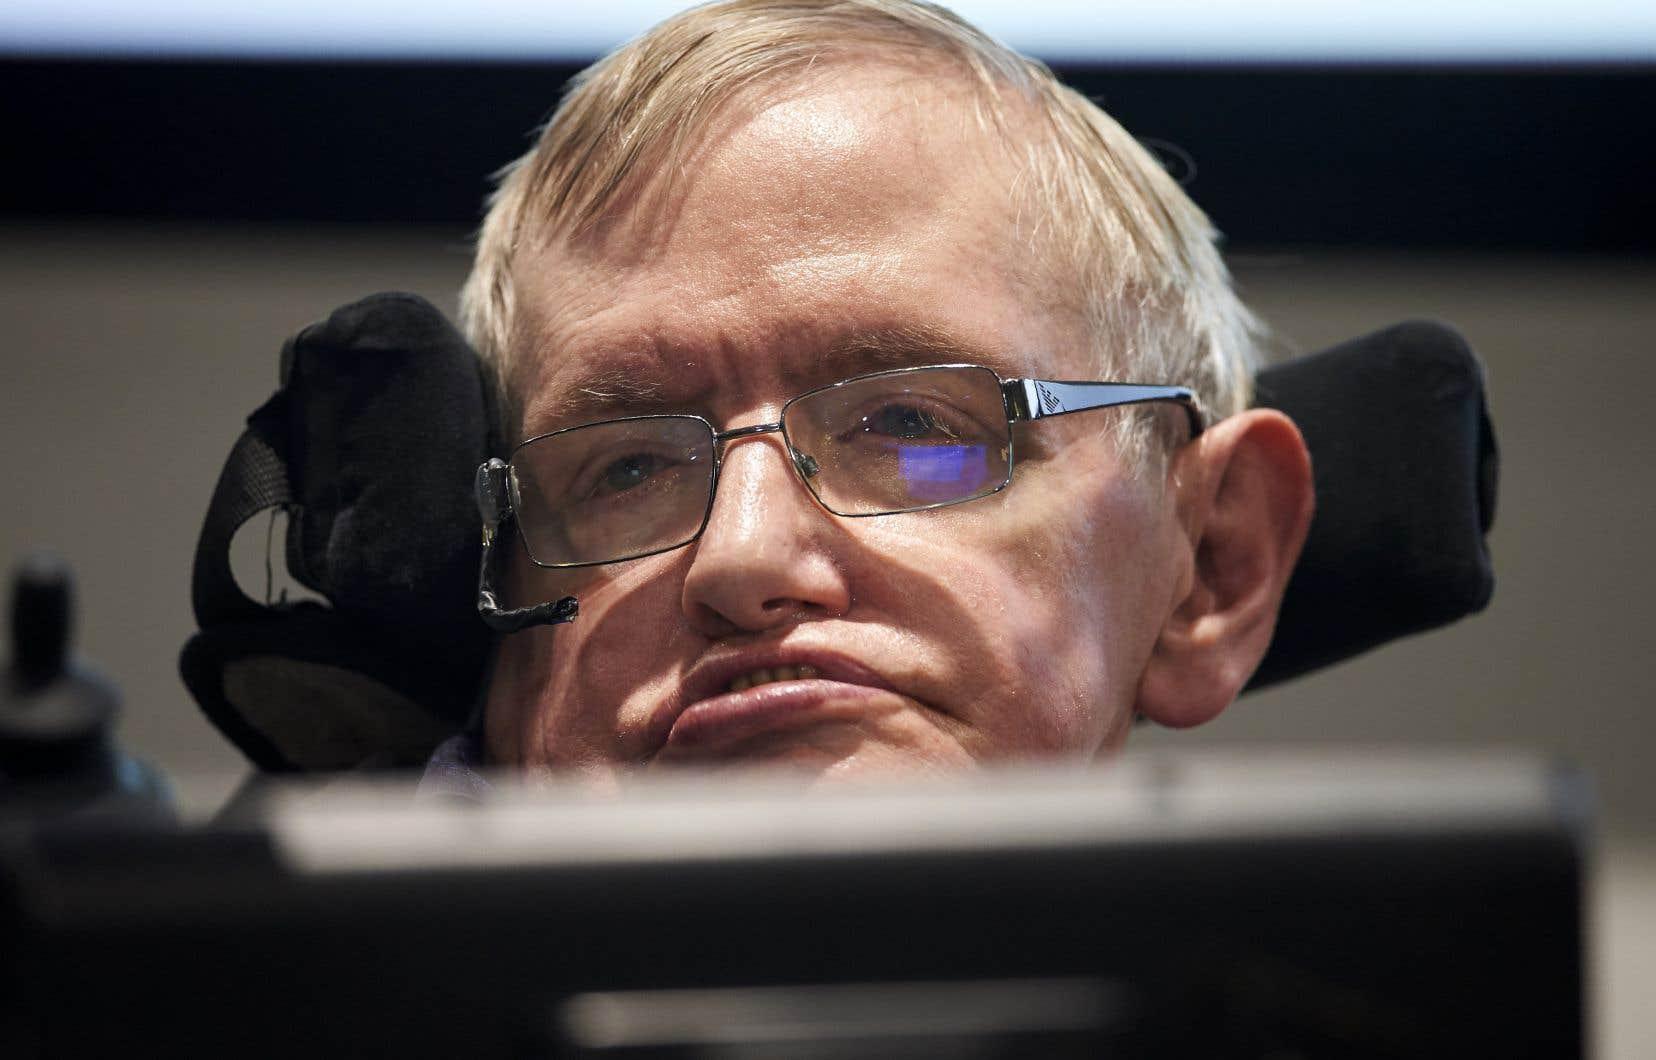 L'astrophysicien britannique Stephen Hawking